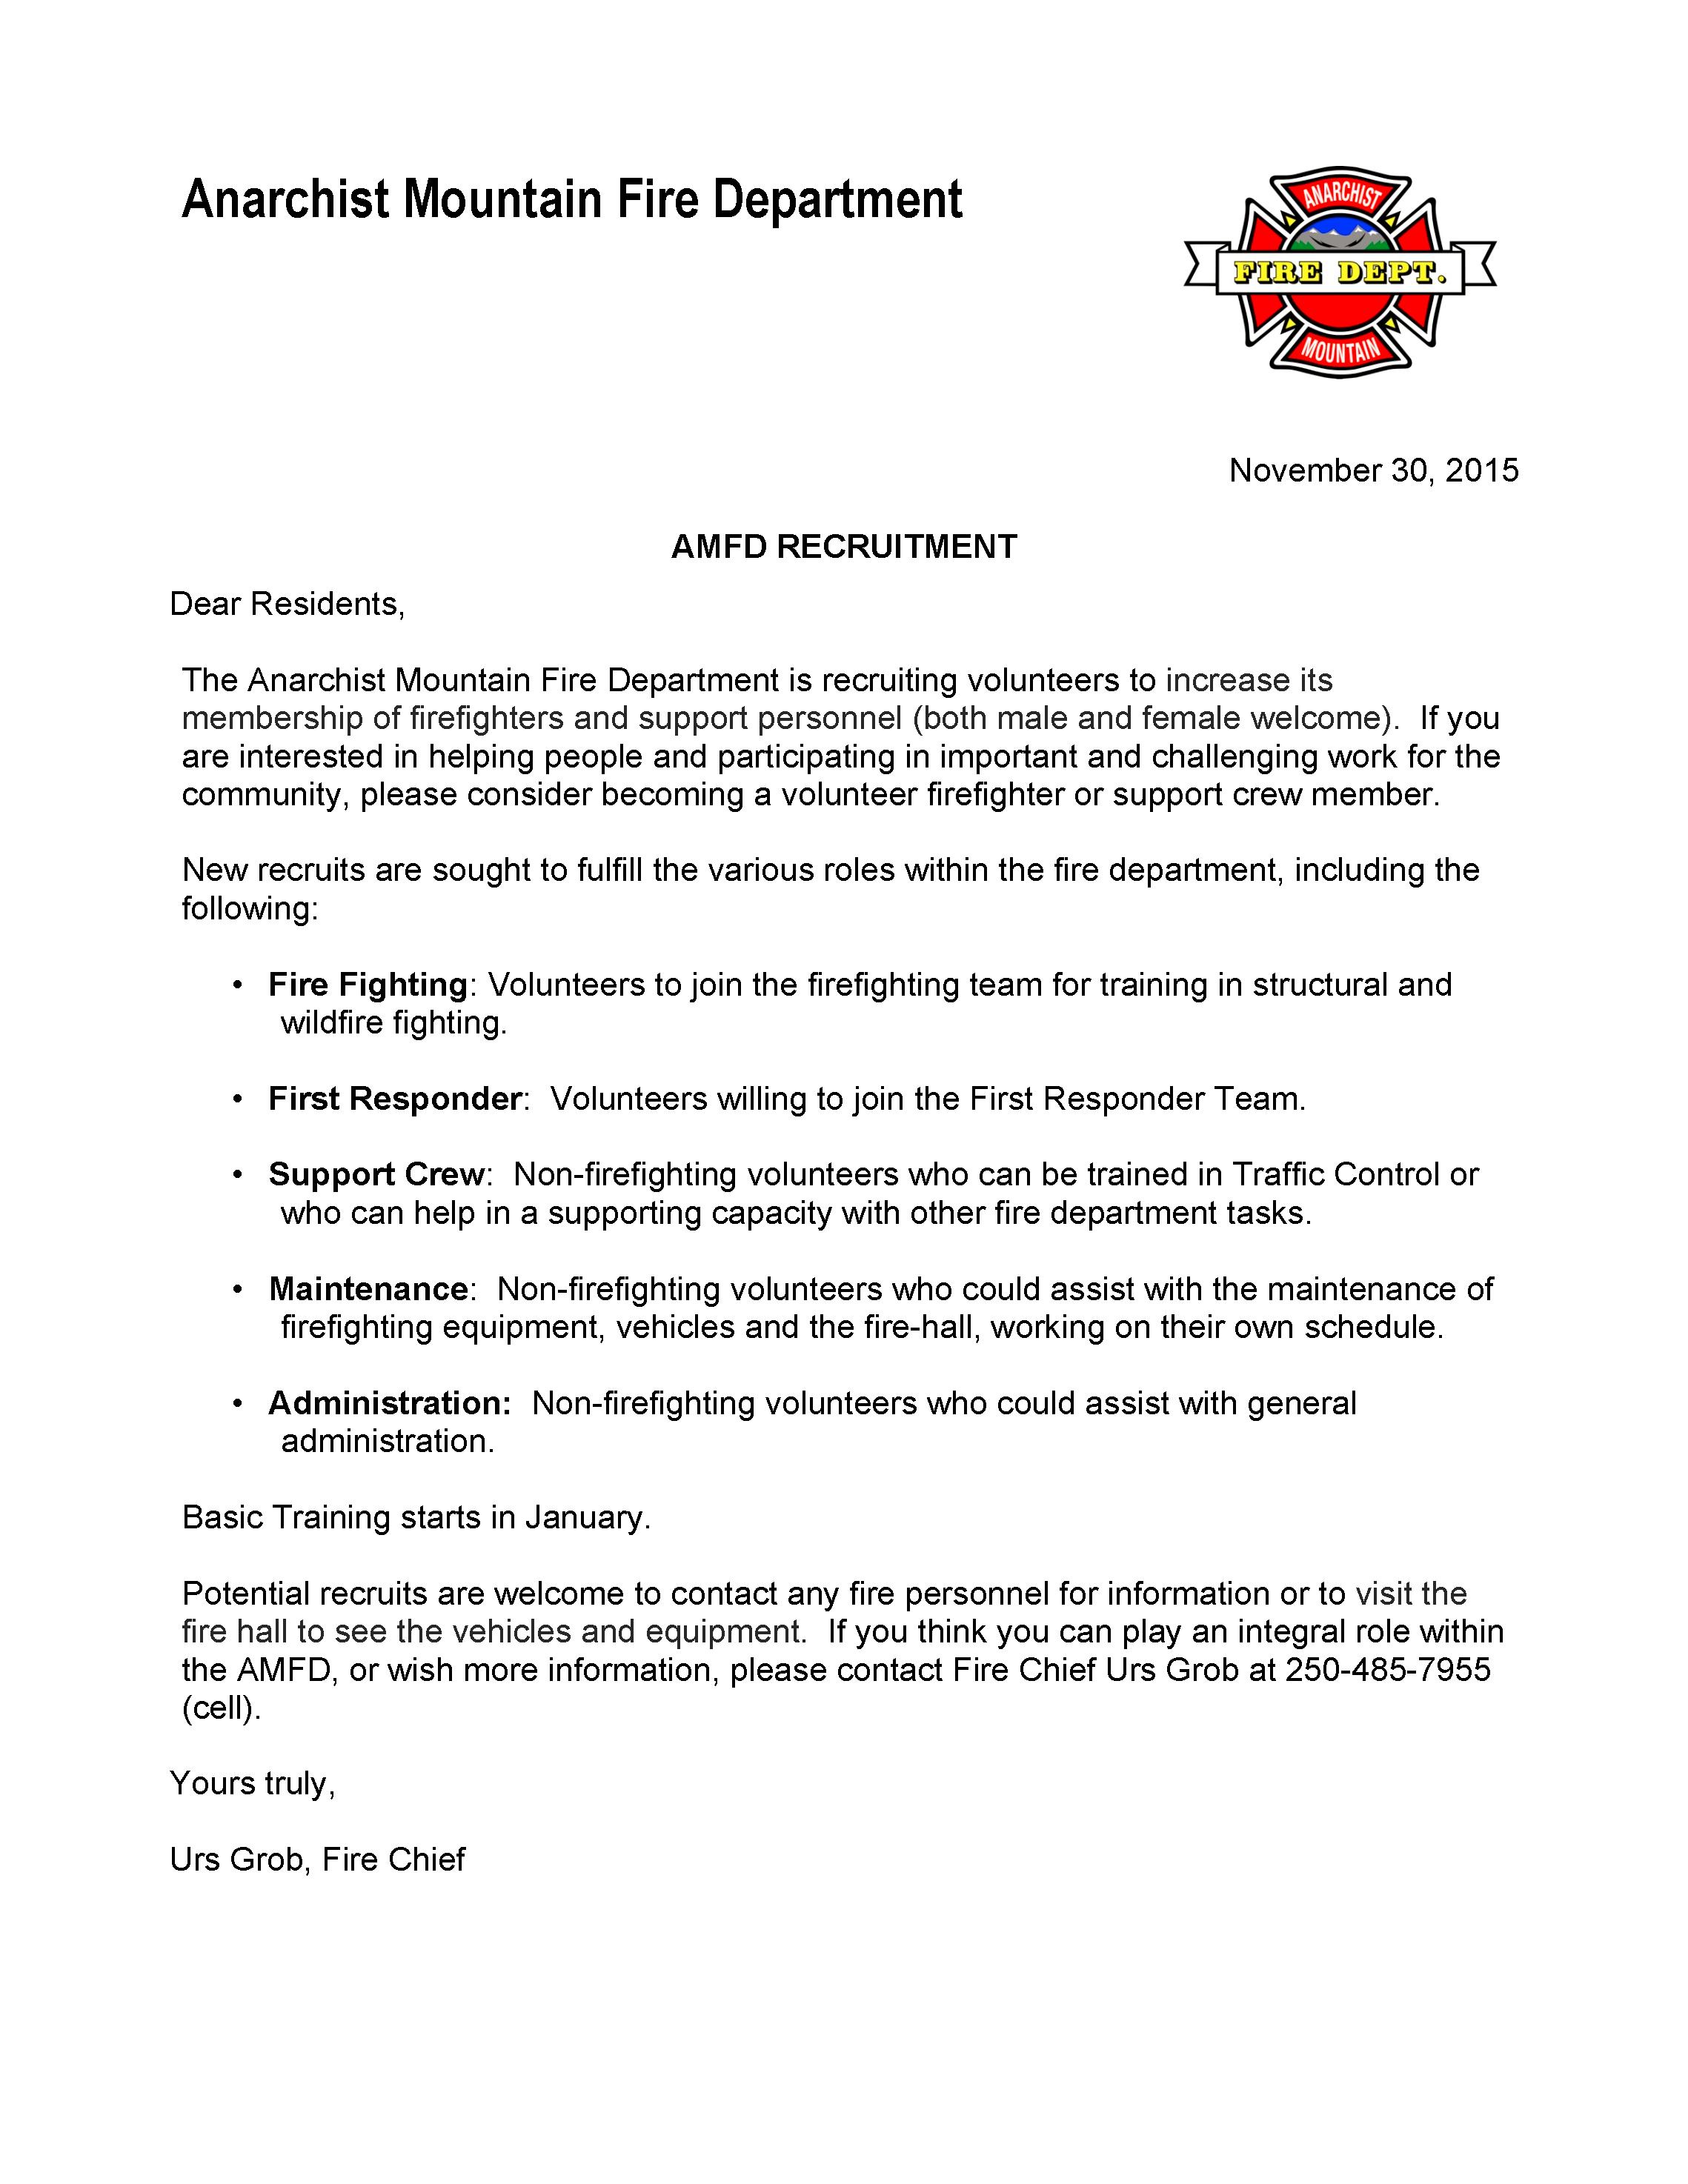 AMFD Volunteer Recruitment | Anarchist Mountain Community Society